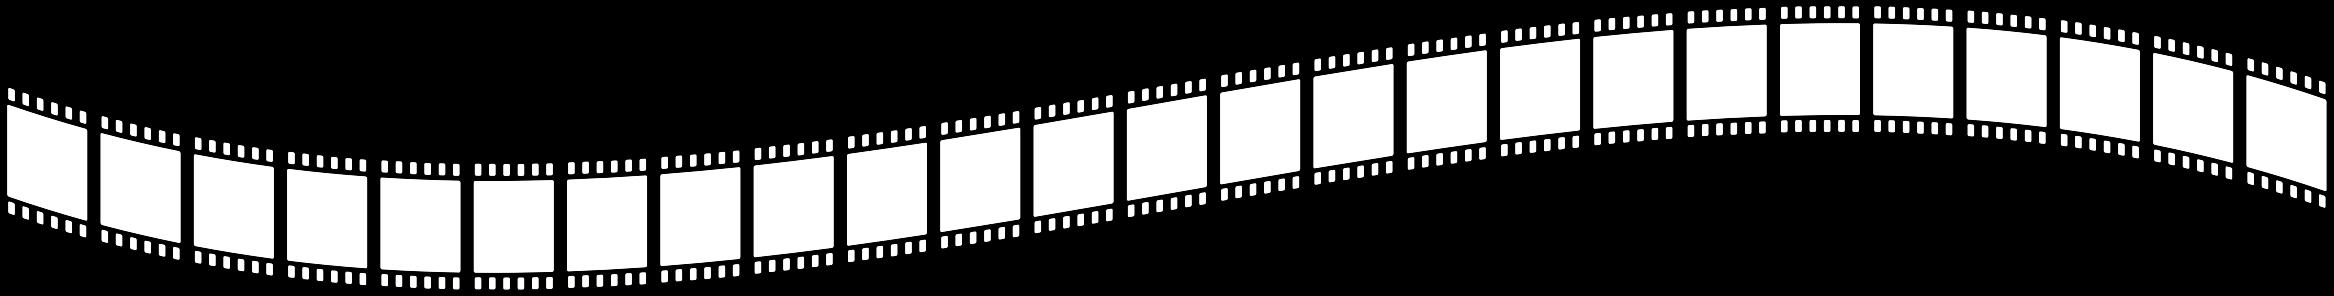 Strip big image png. Film clipart wavy